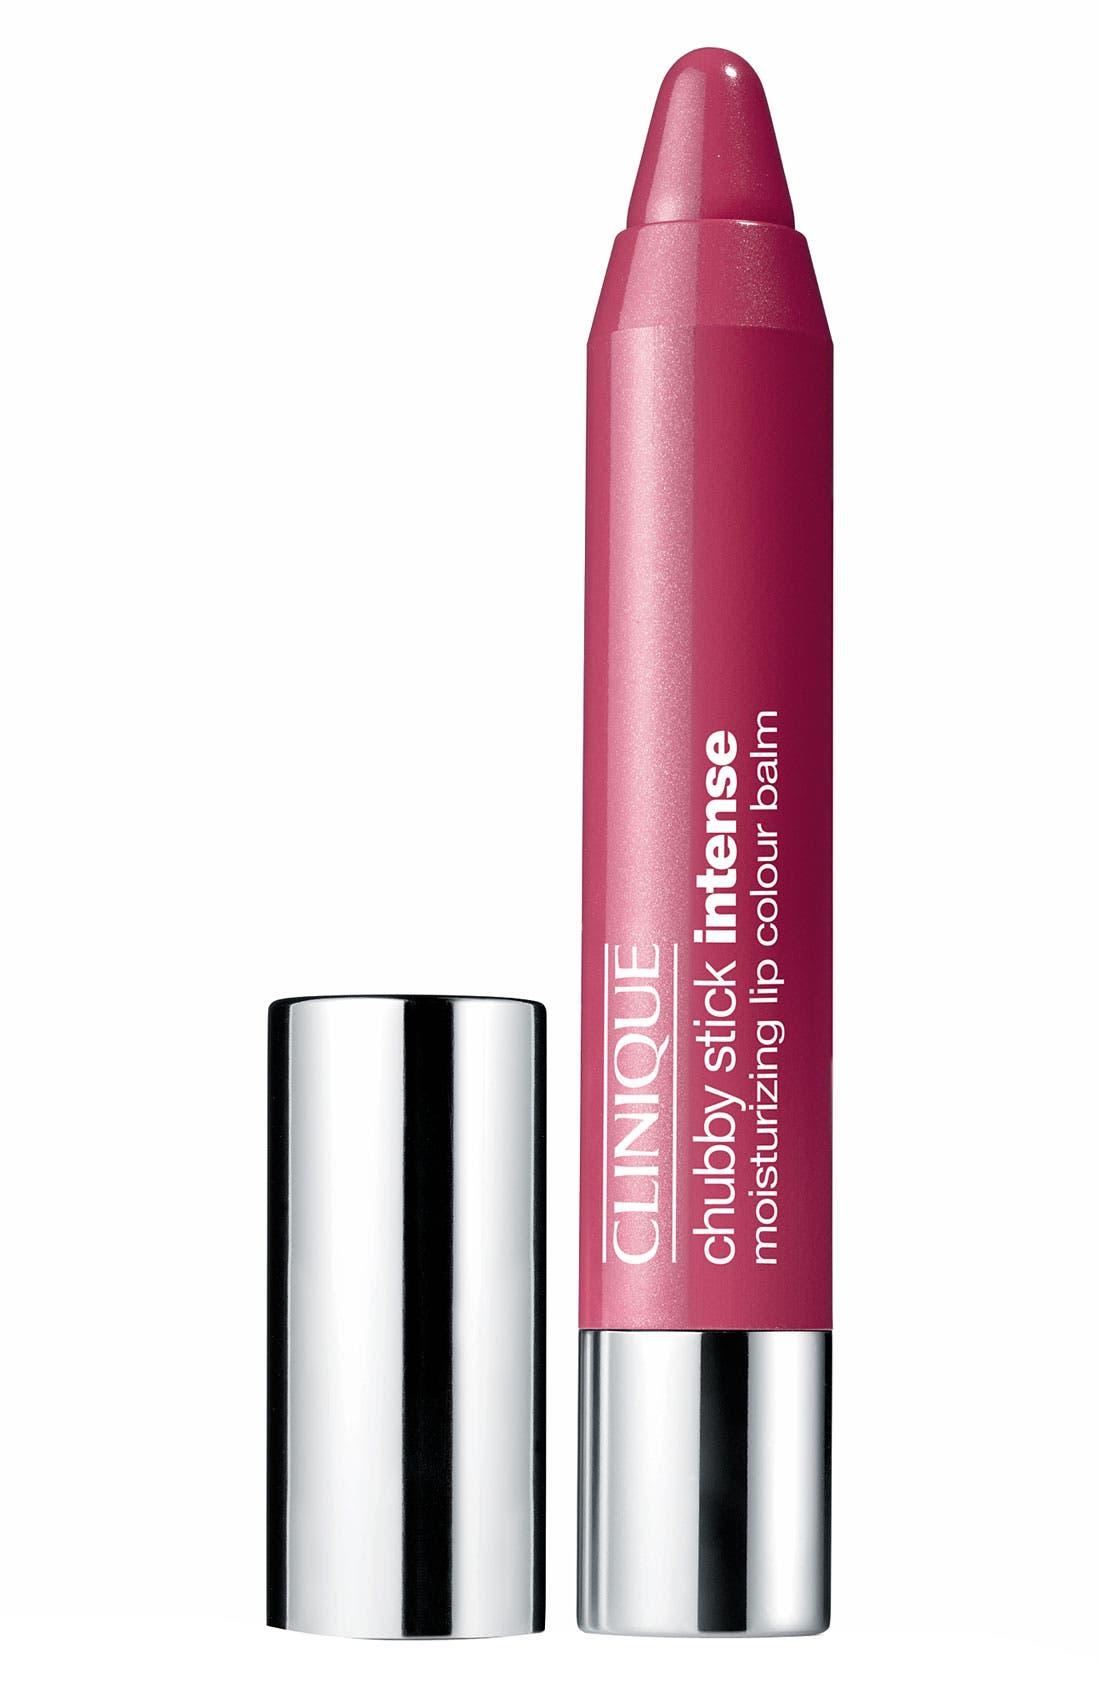 Clinique 'Chubby Stick Intense' Moisturizing Lip Color Balm